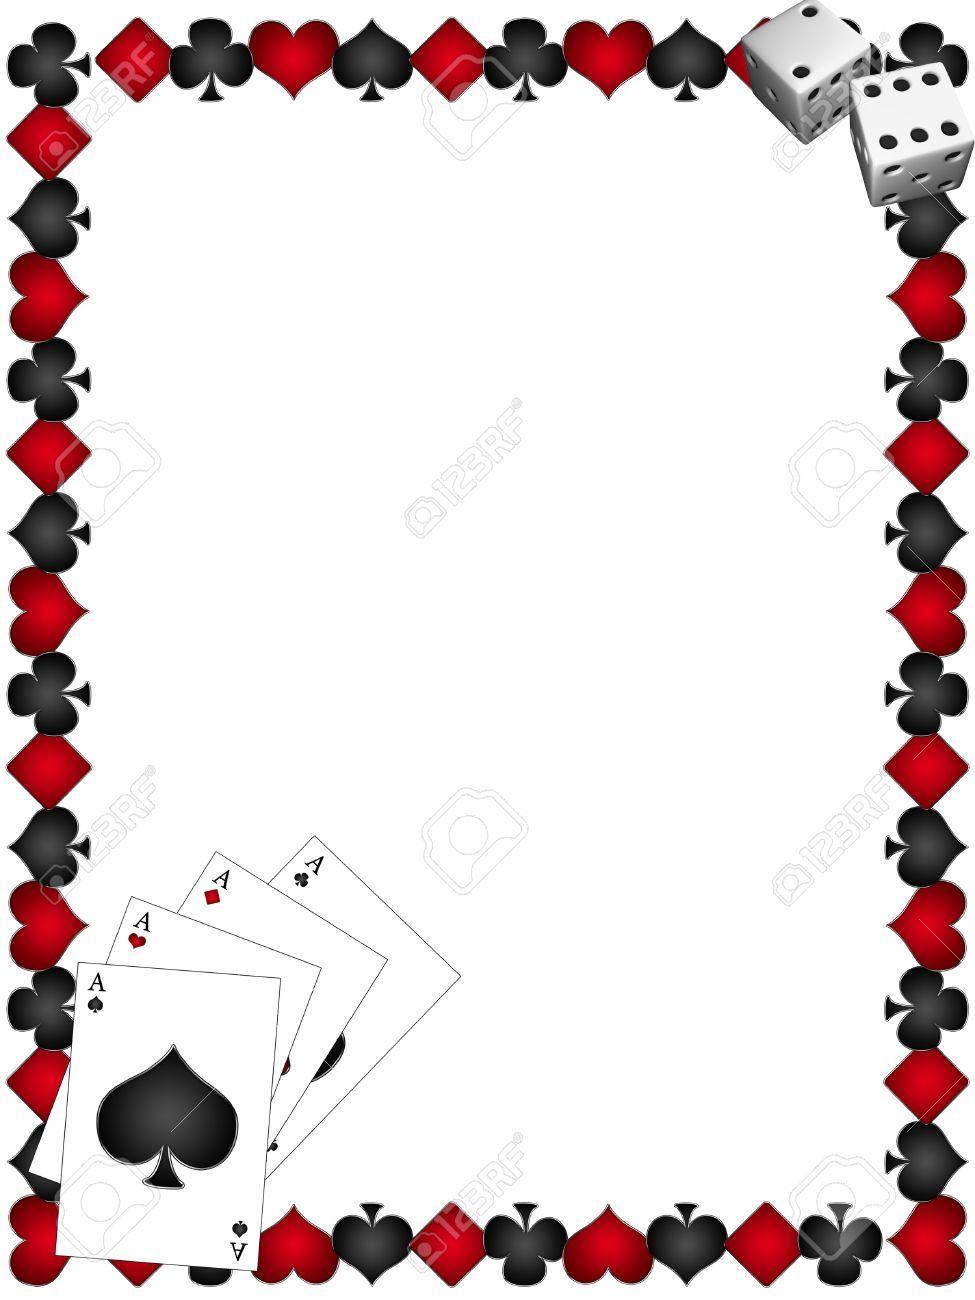 Deck Of Cards Photo Booth Picture Frame Template Buscar Con Google Den Rozhdeniya Prazdnik Produkty